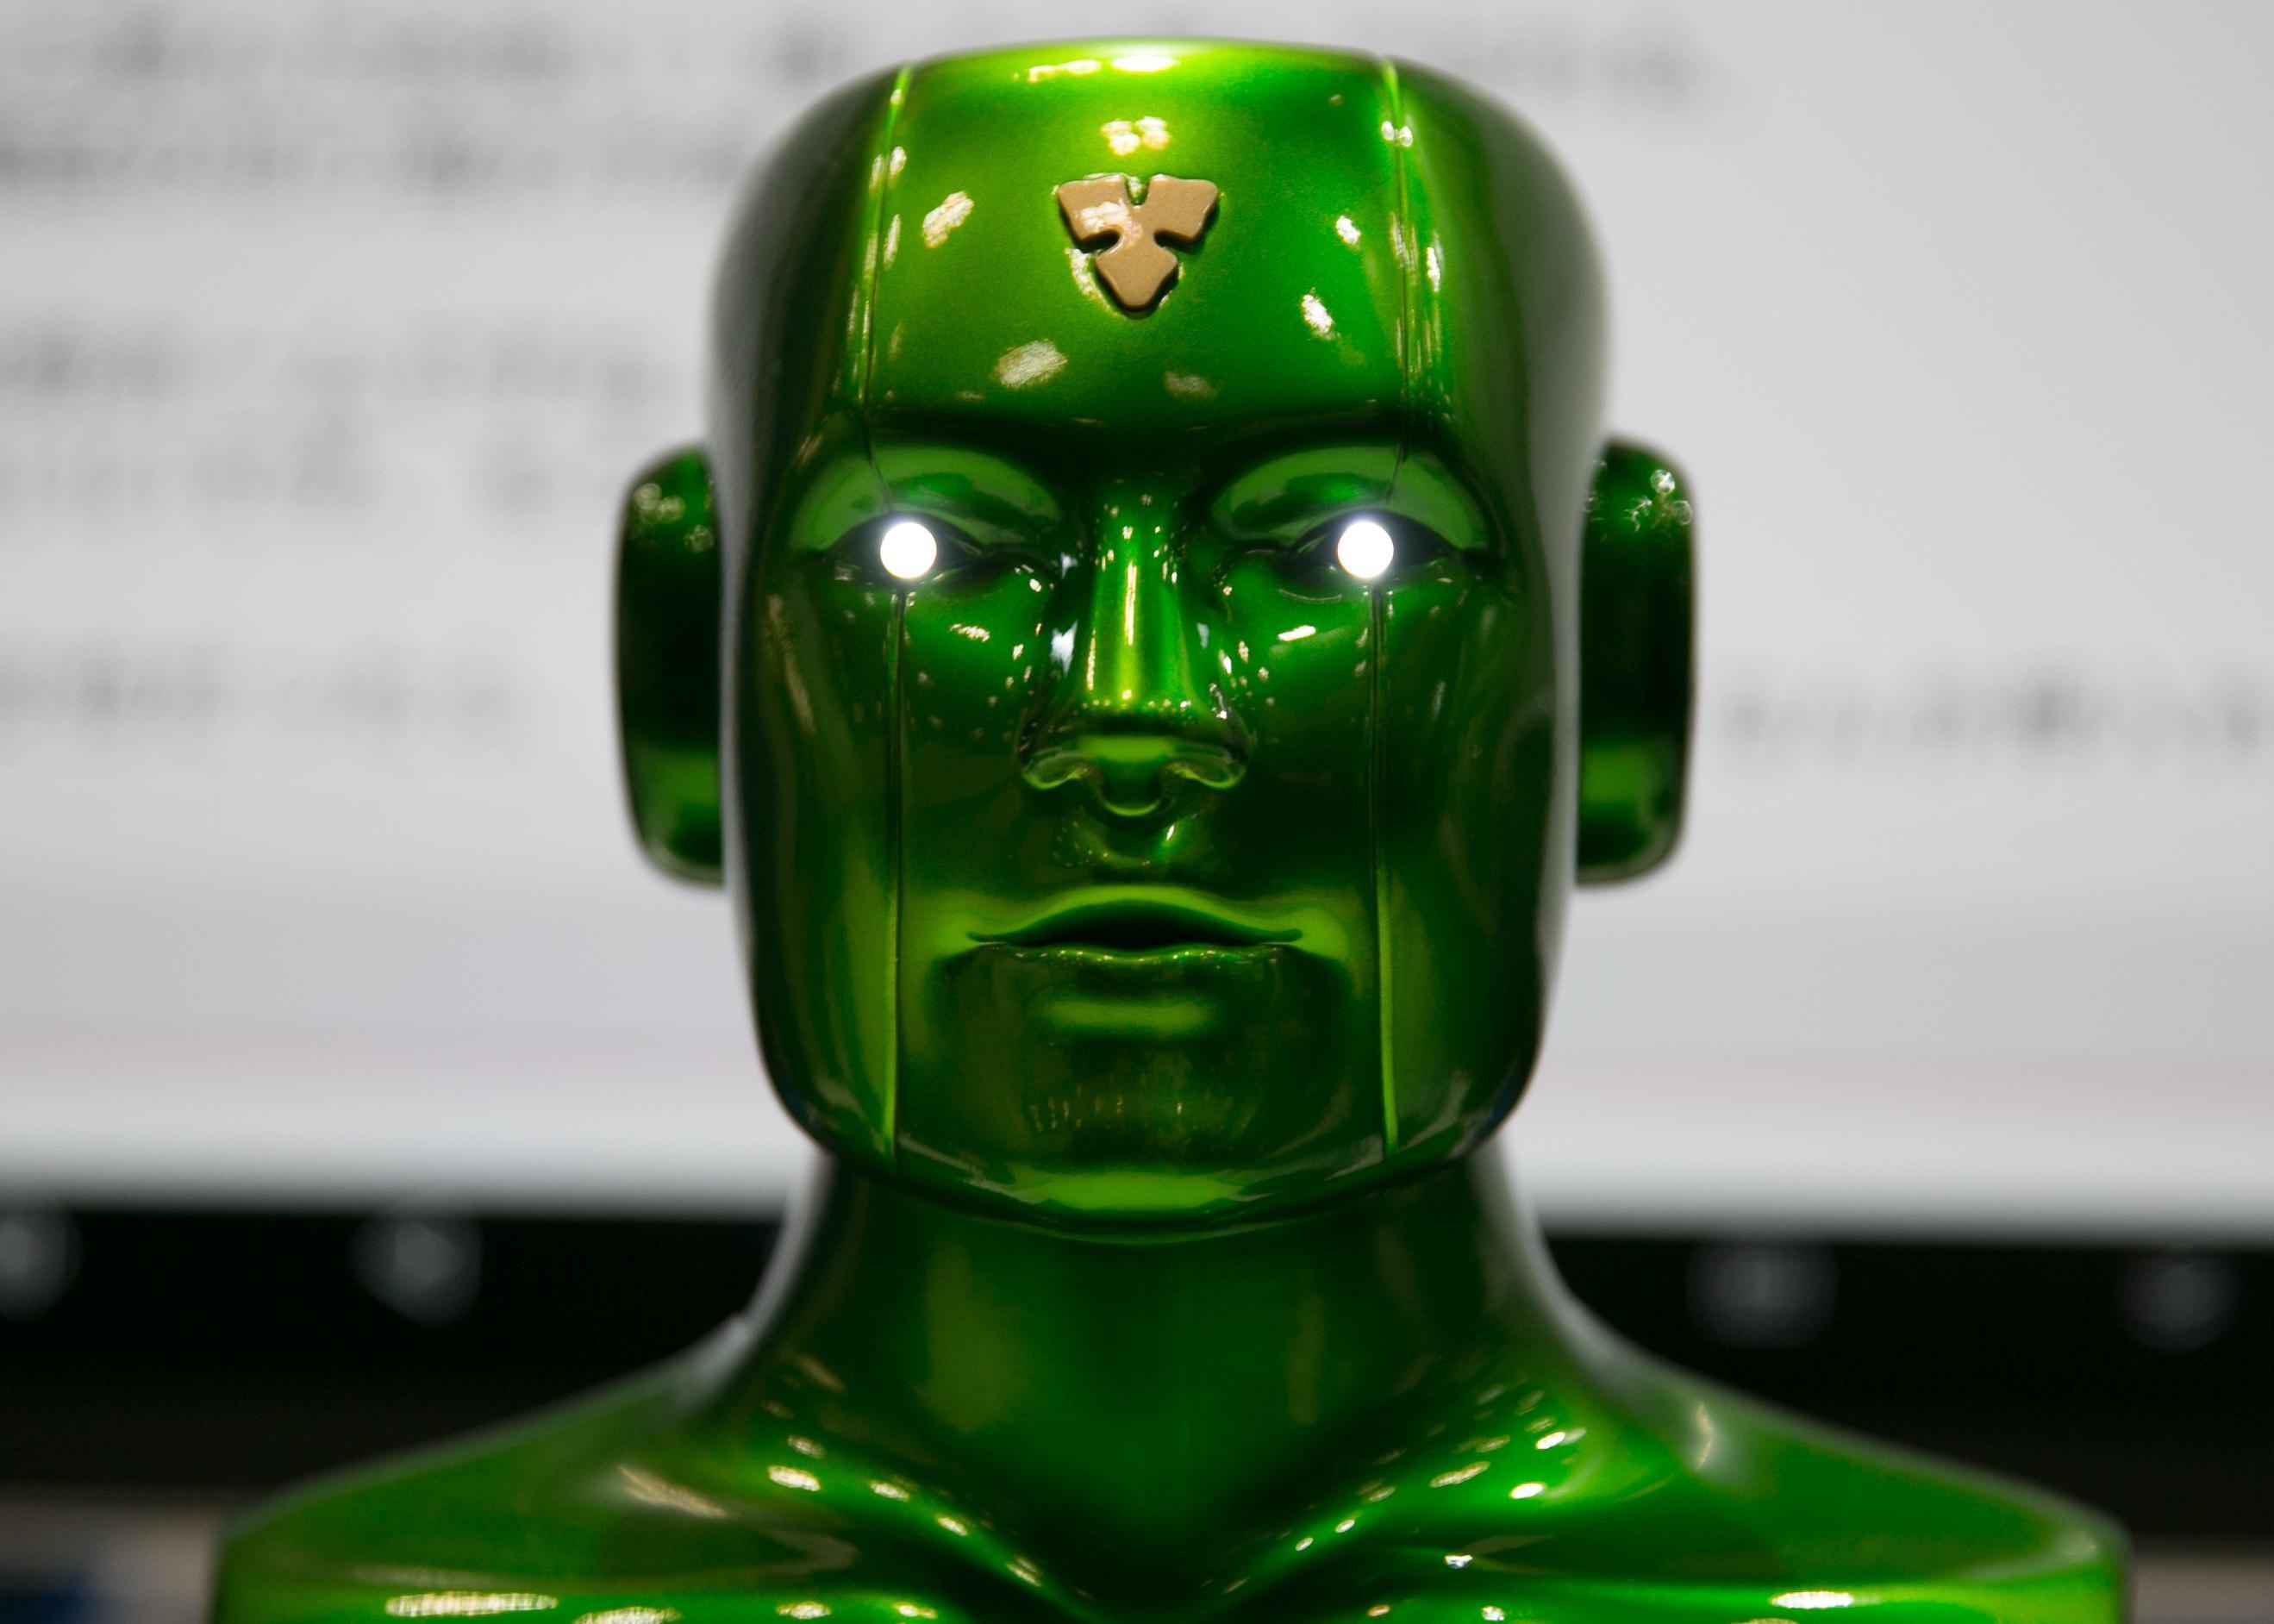 Intelligenza artificiale legge pensiero